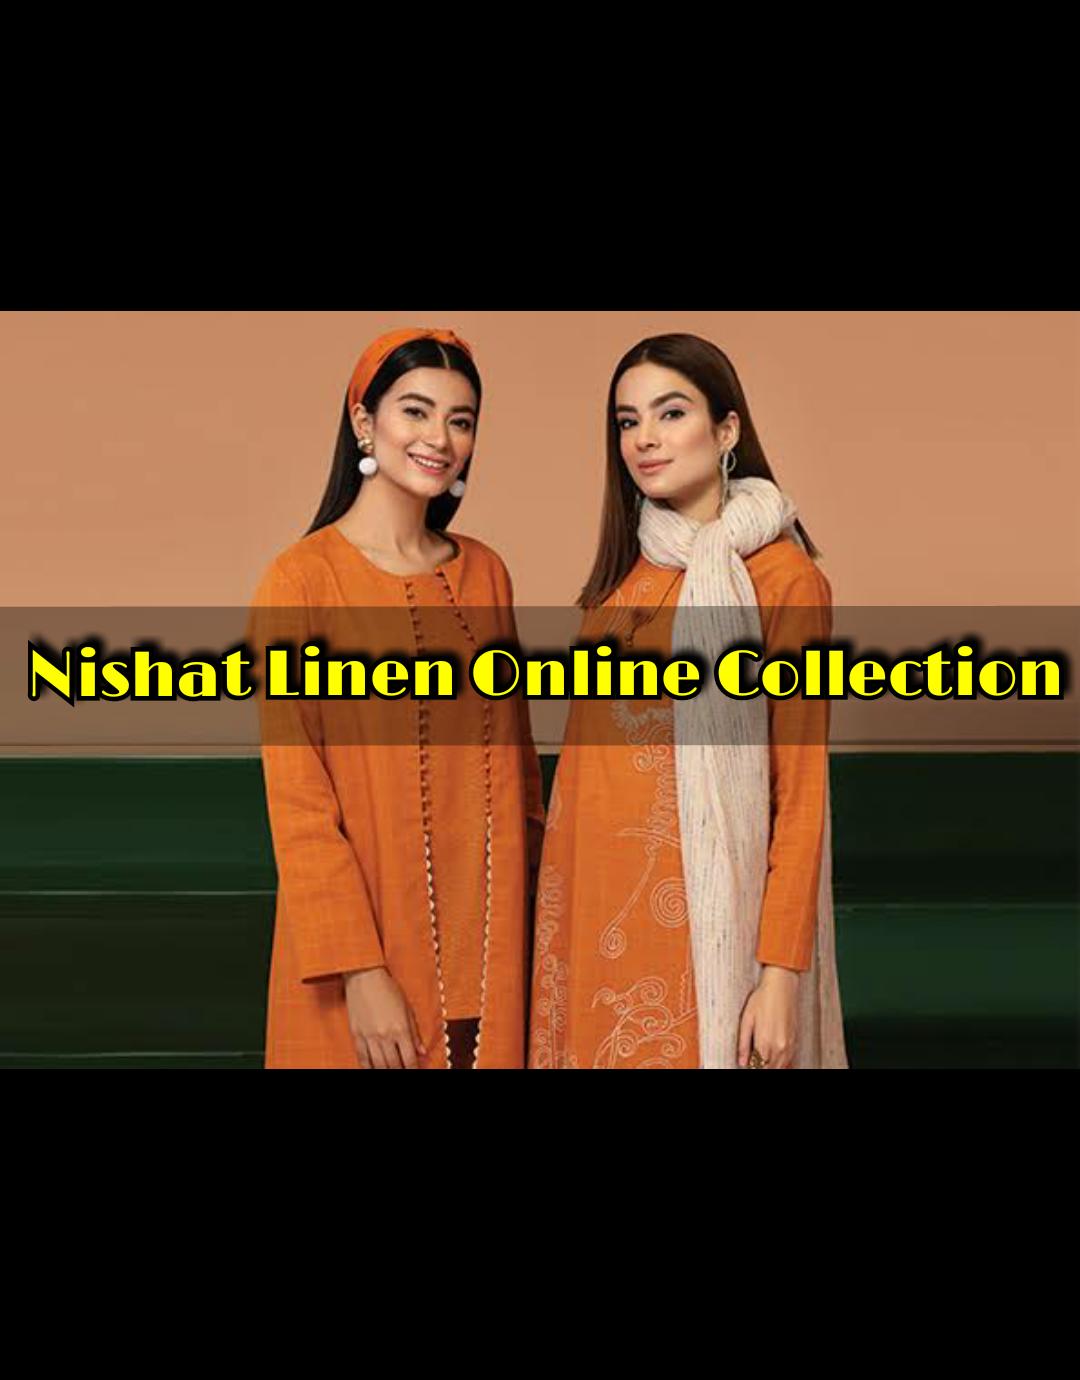 nishat linen dresses